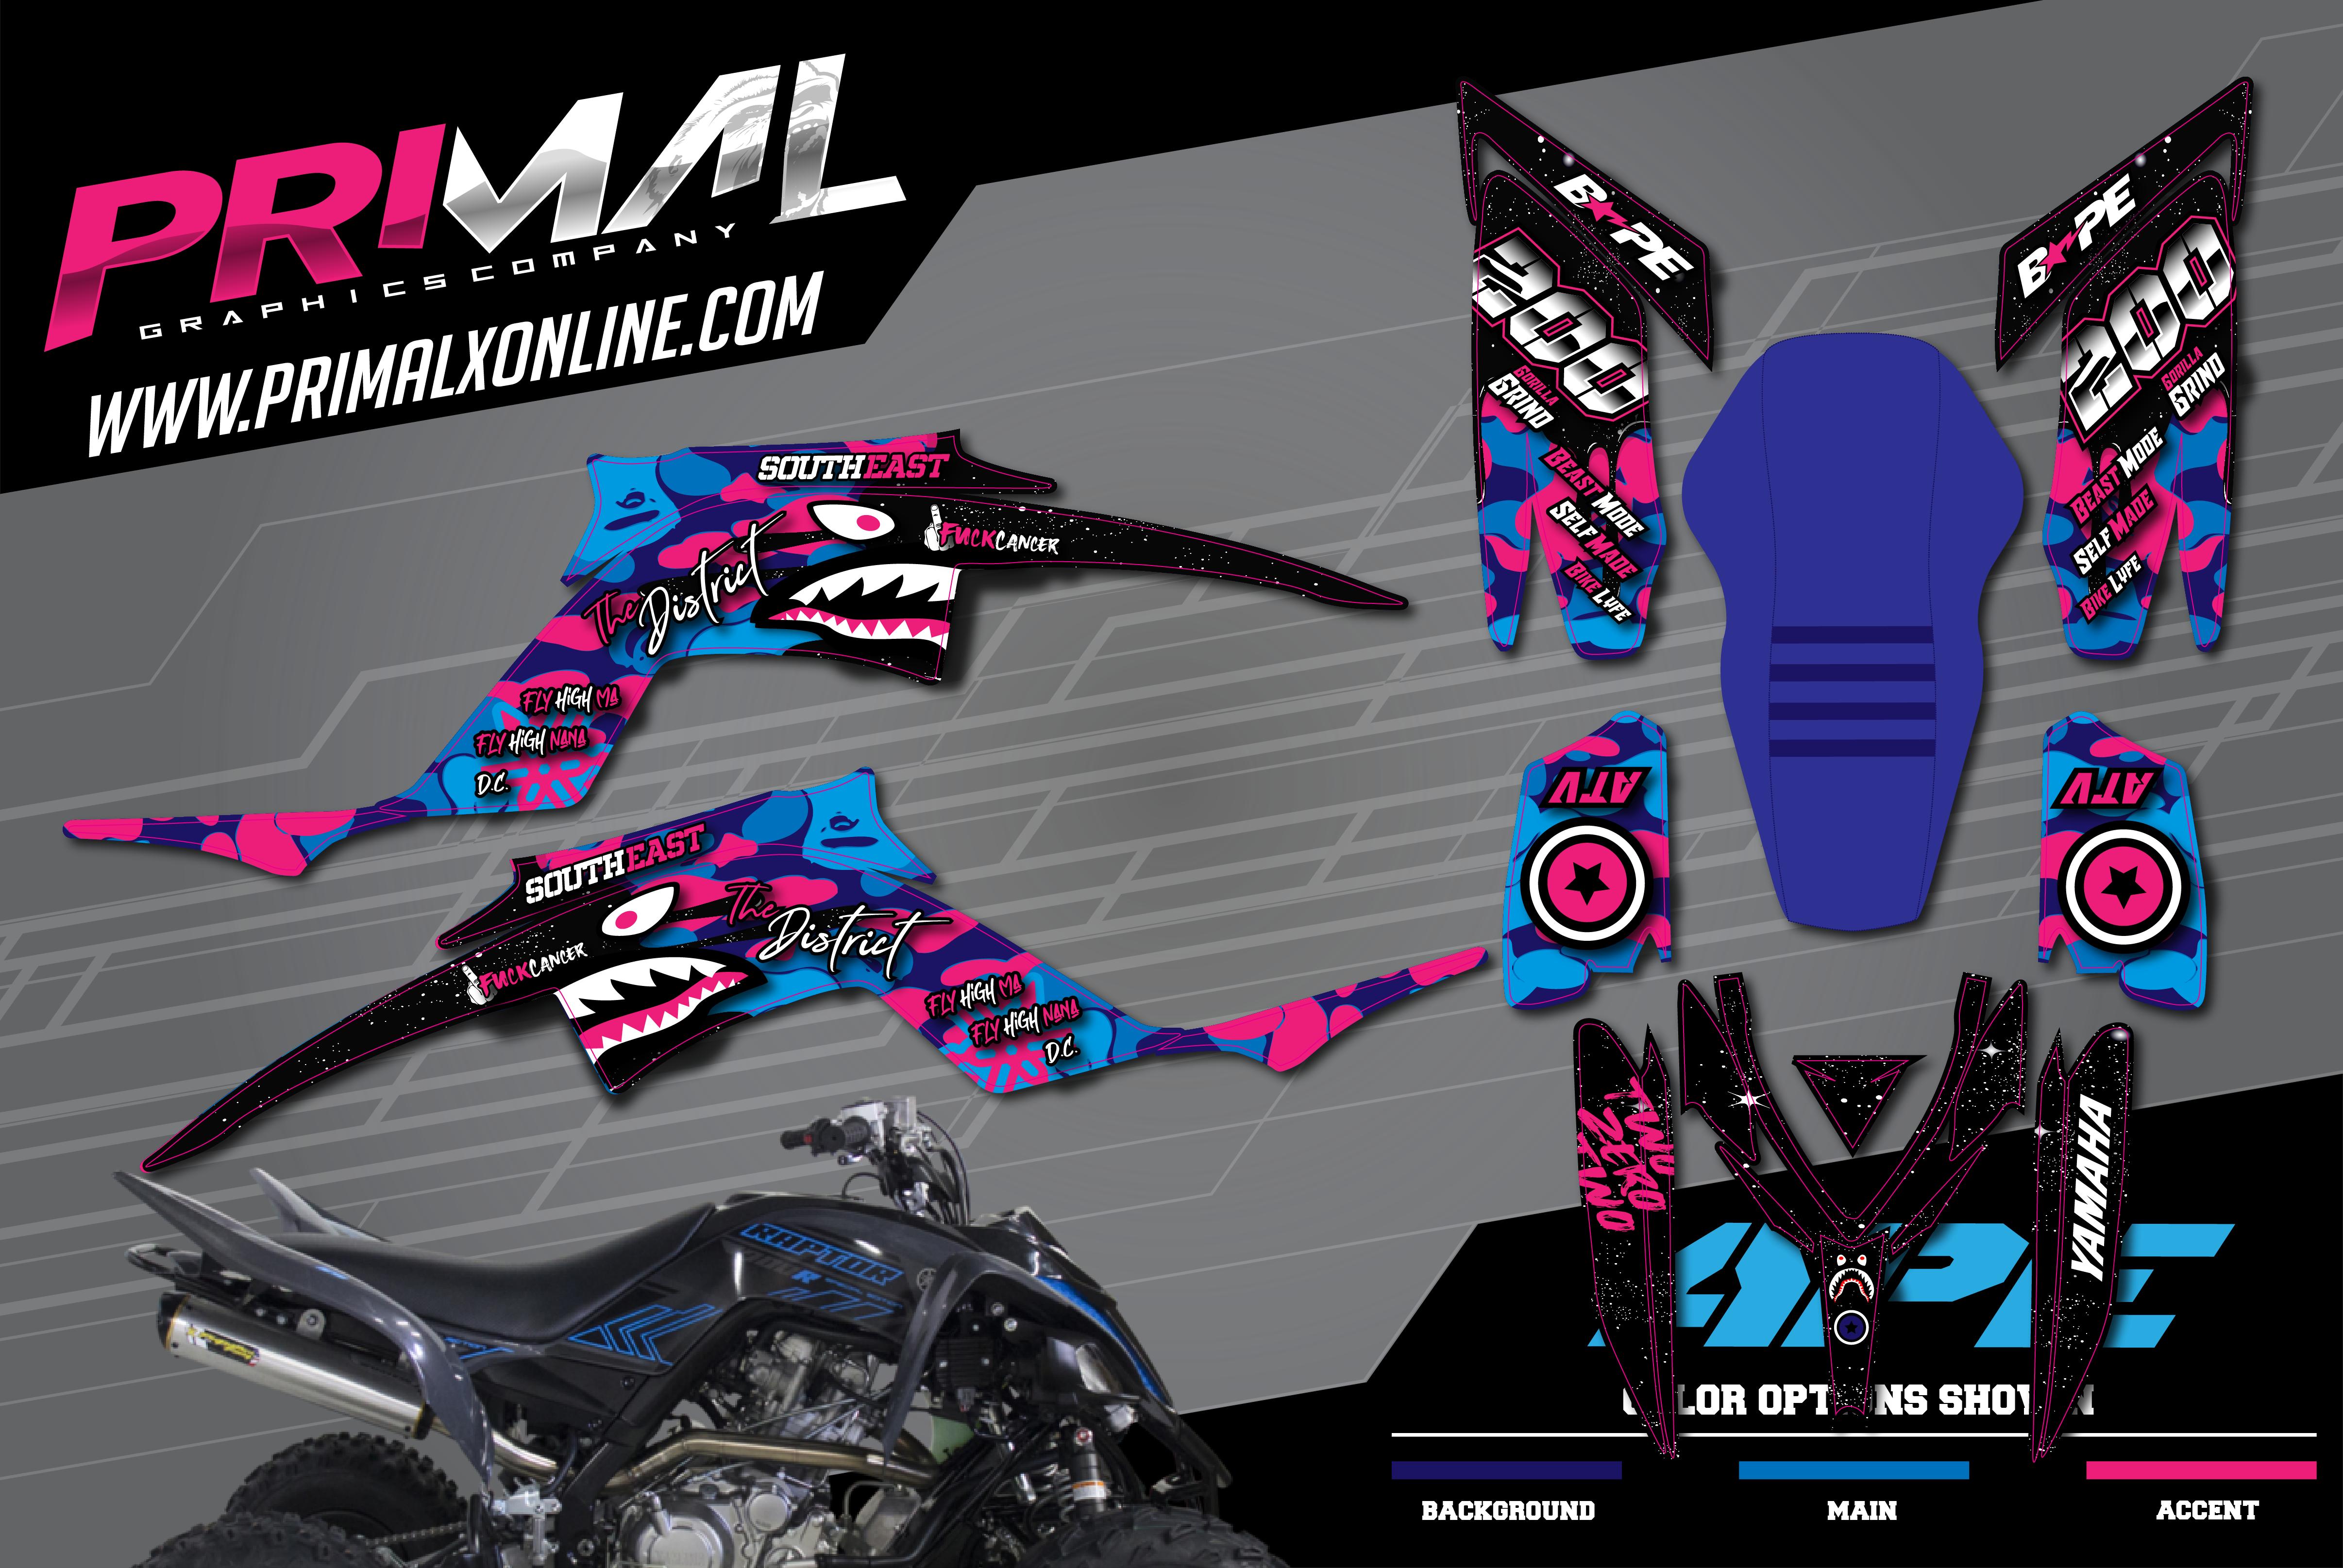 1_PRIMAL-X-MOTORSPORTS-PRIMAL-GRAPHICS-CO-2021-YAMAHA-RAPTOR-MOTOCROSS-GRAPHICS-APE-SERIES-01